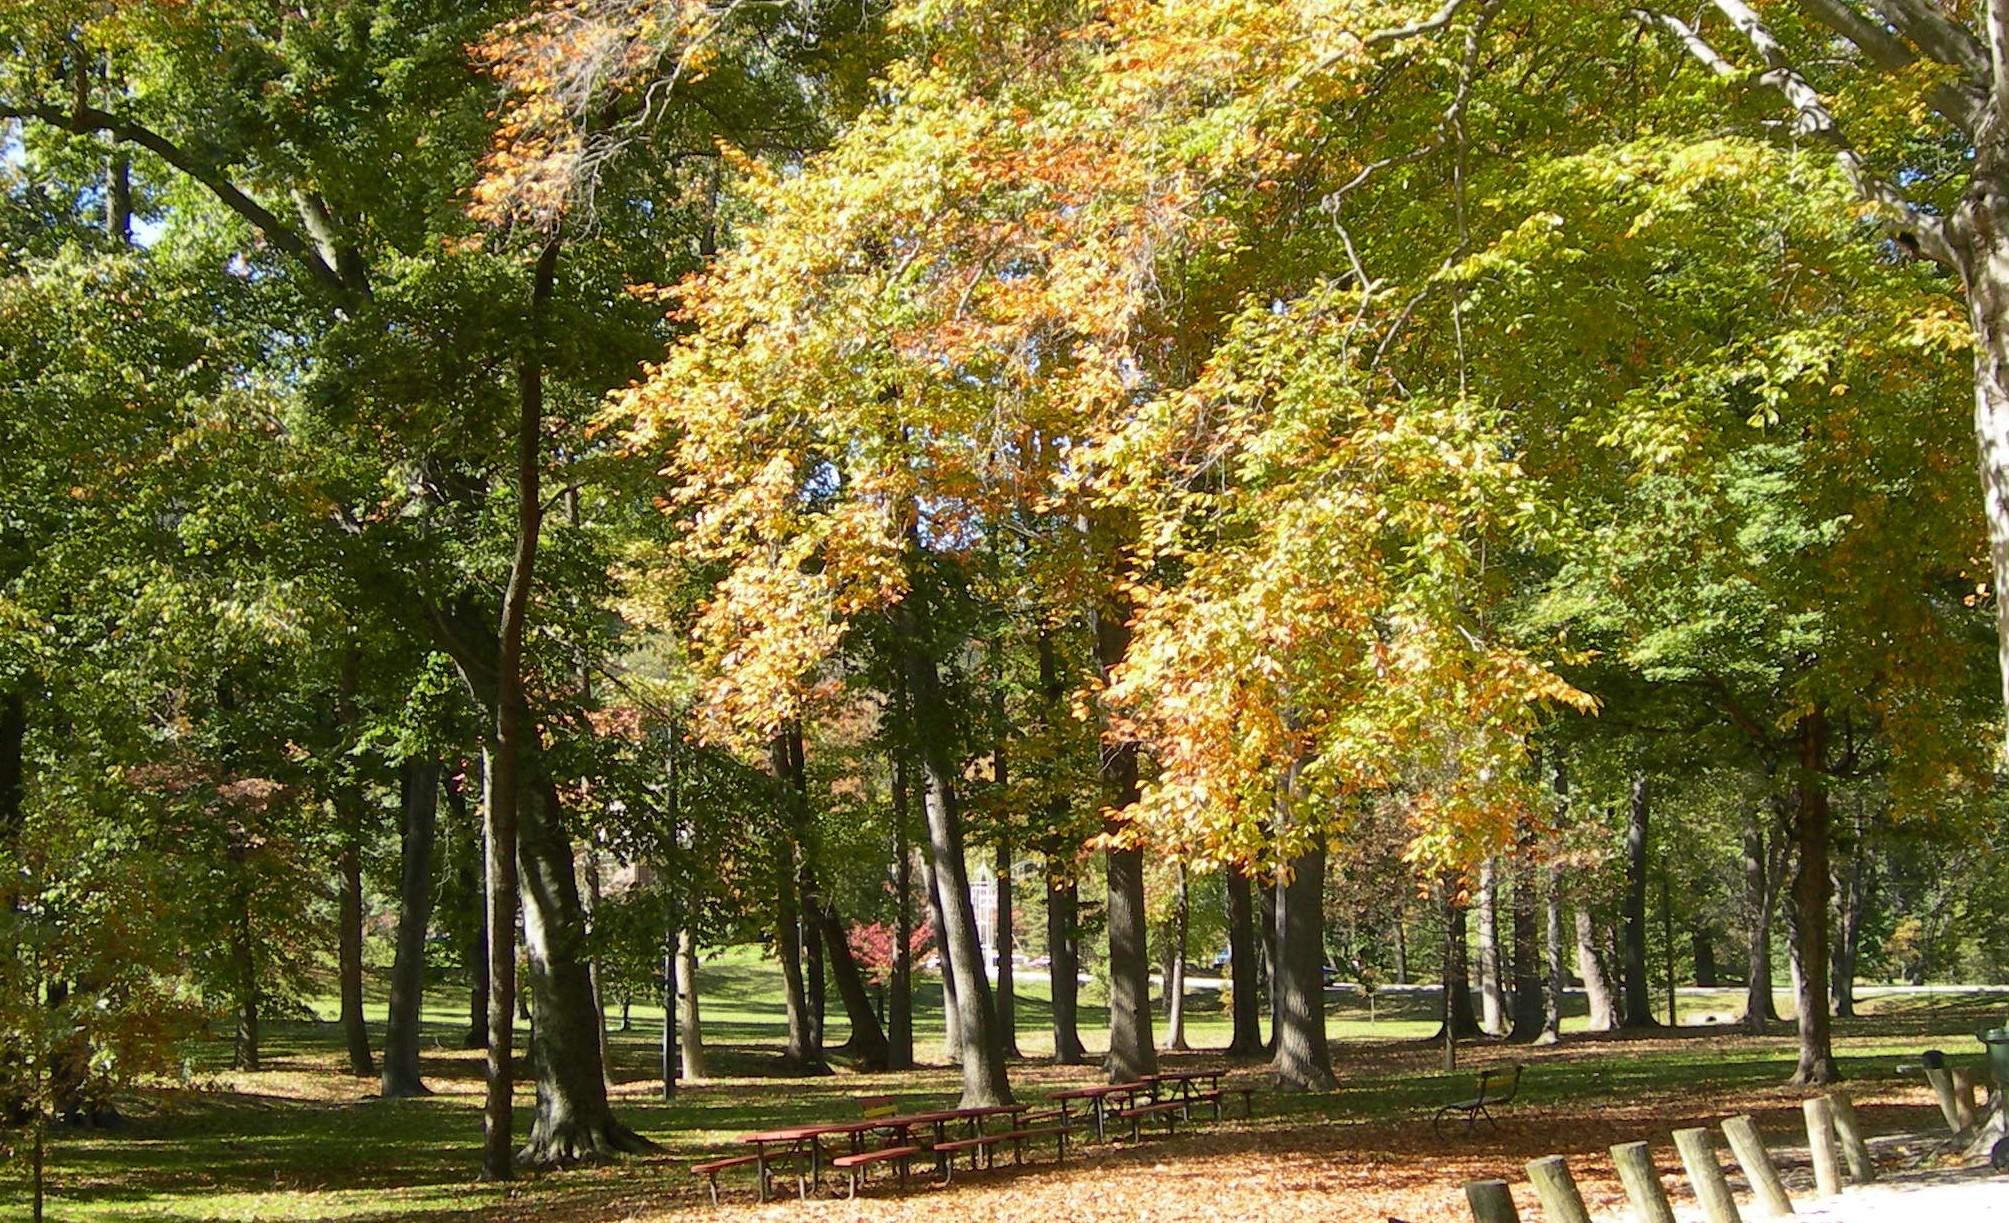 File:Central Park trees Ashland KY Oct 2006.JPG - Wikipedia